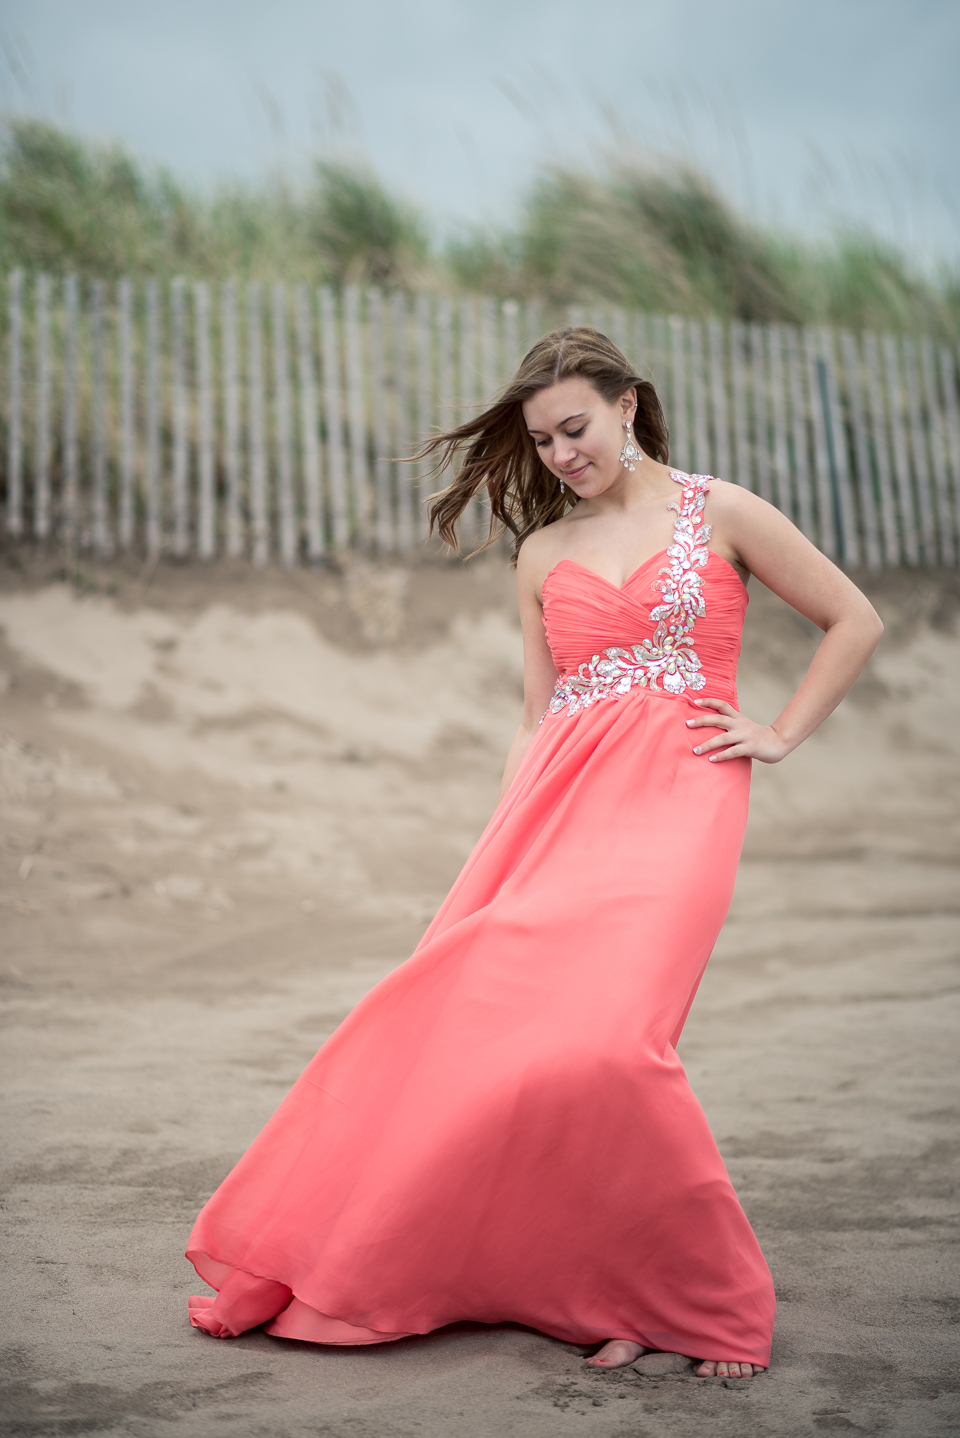 NIgel Fearon Photography | Melanie C-15.jpg